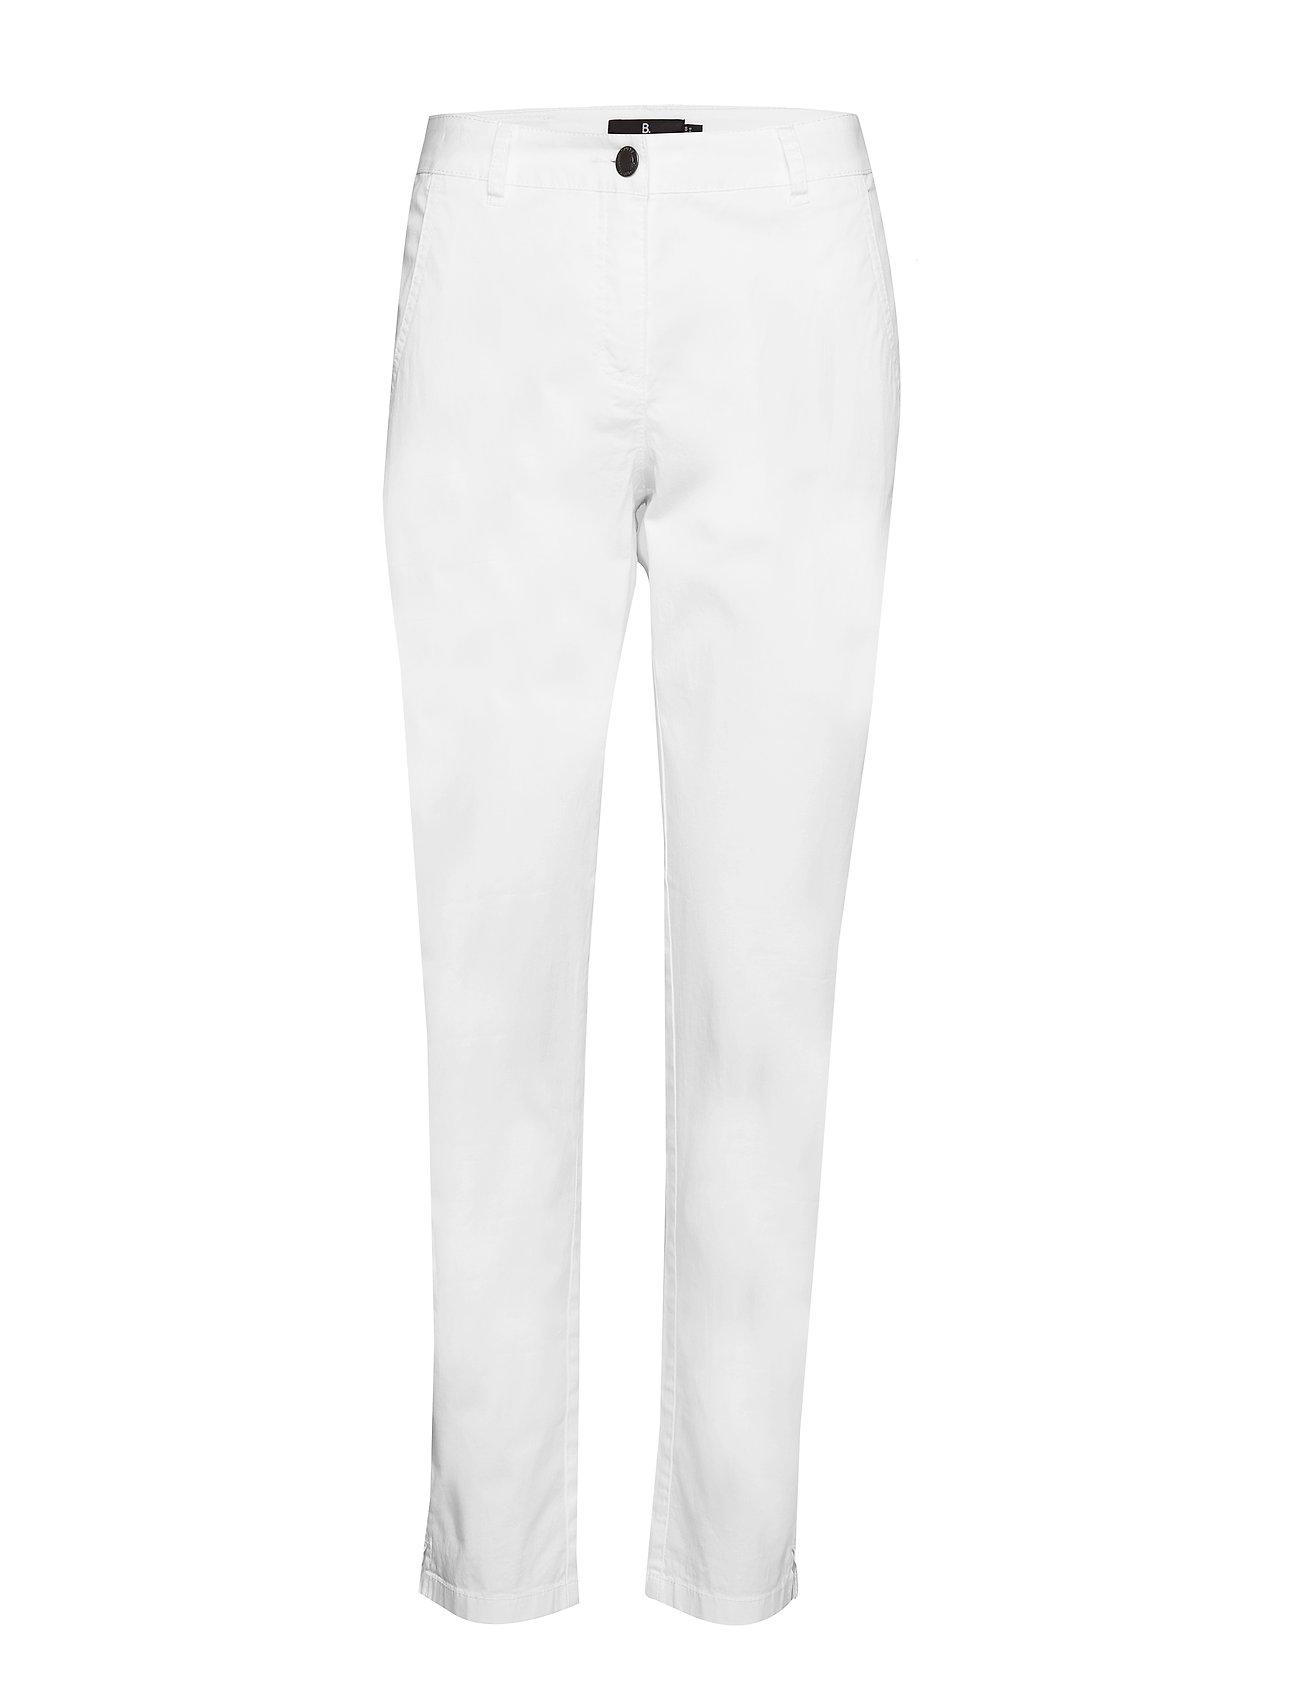 Brandtex Casual pants - WHITE